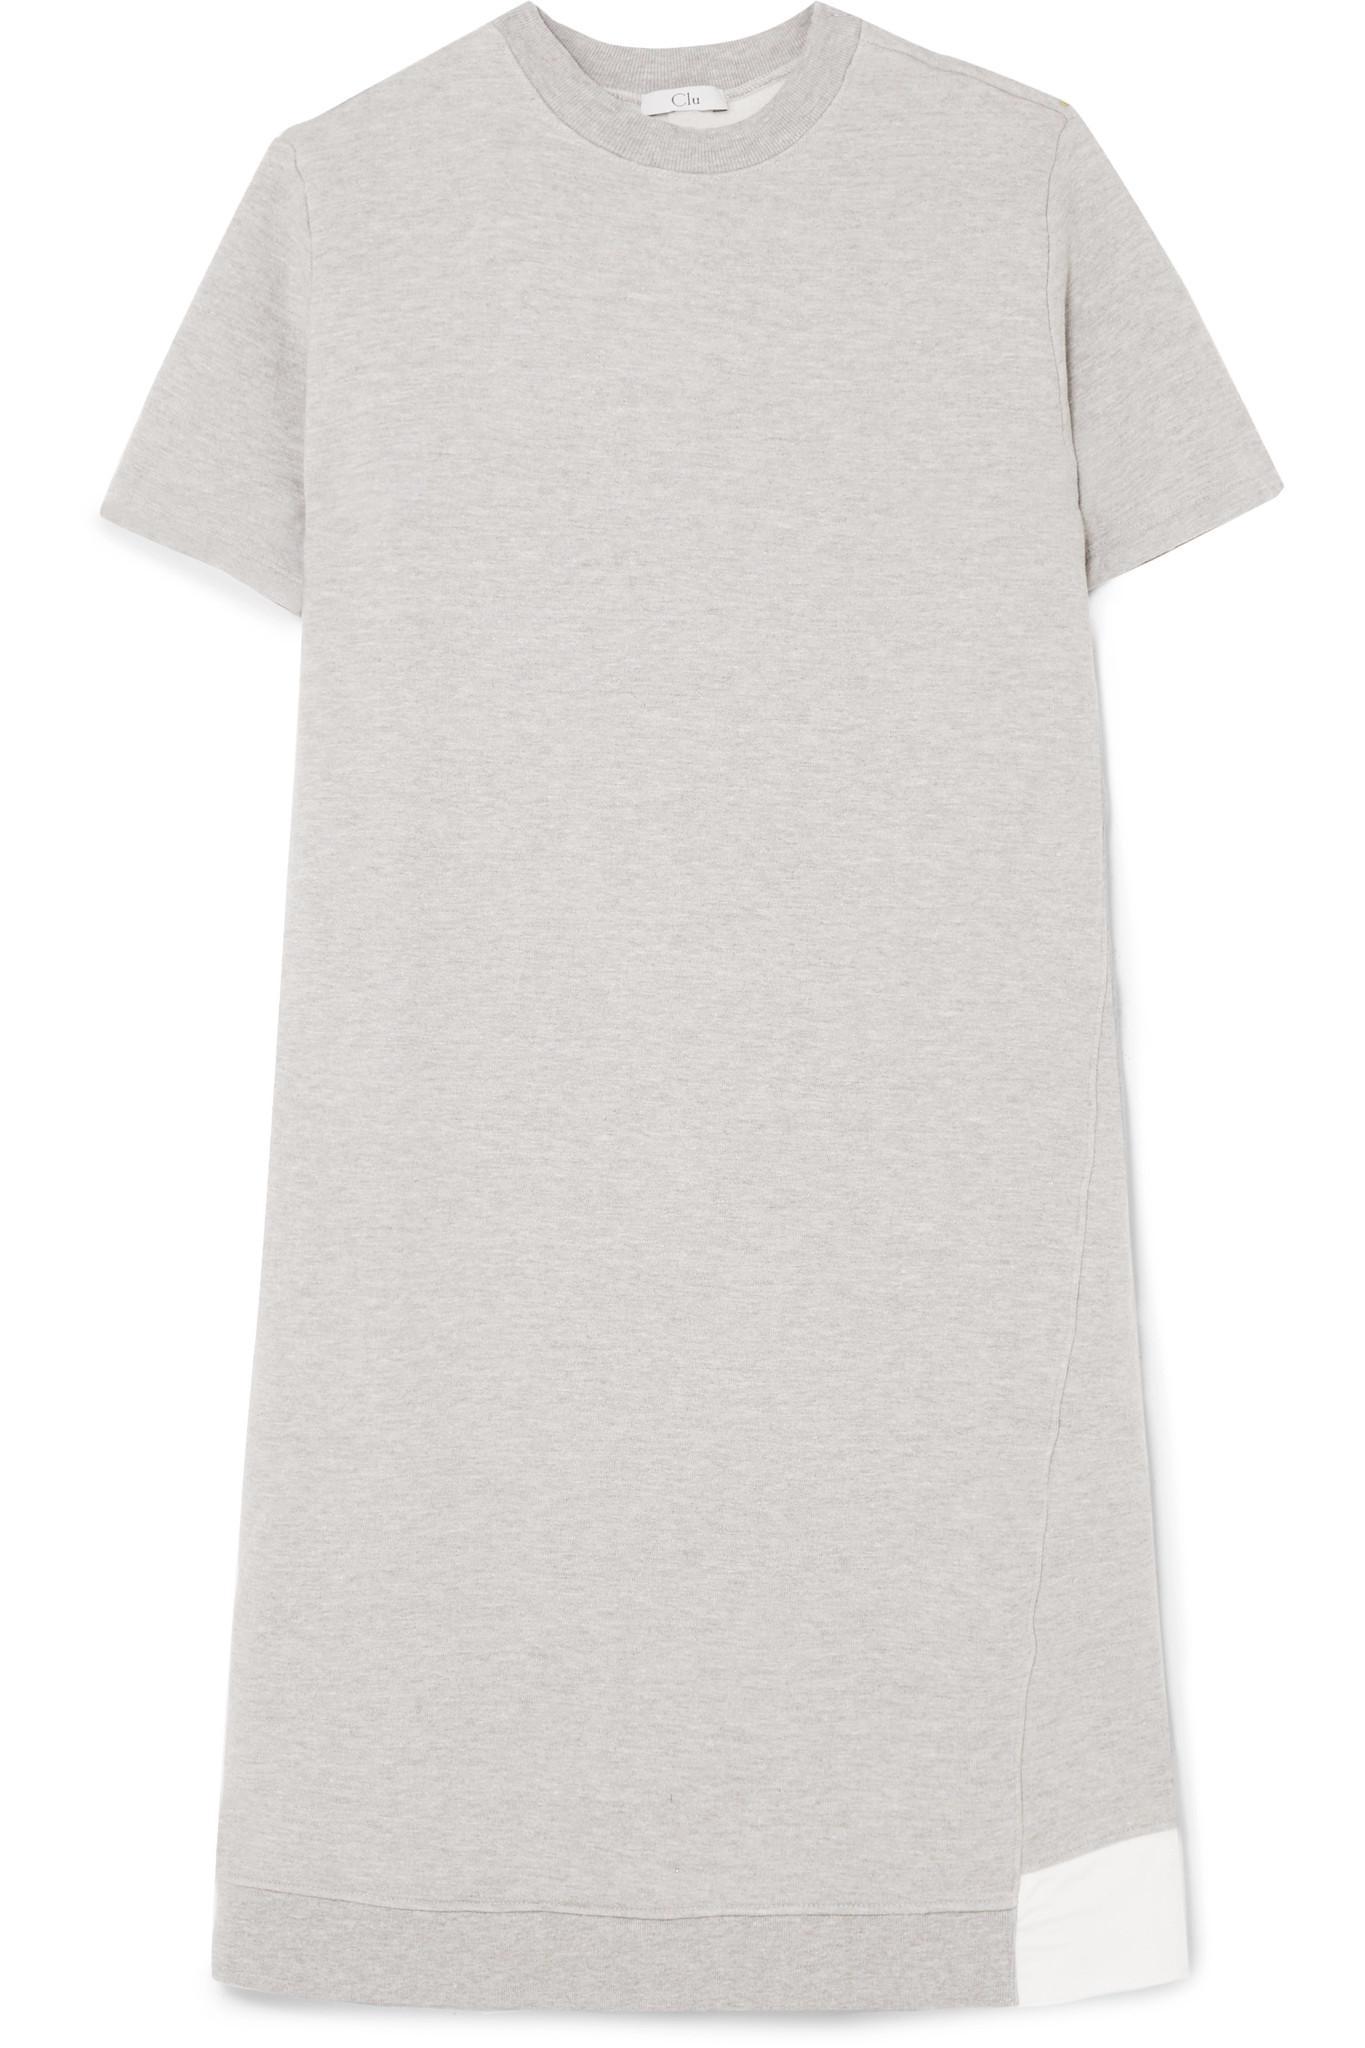 Clu Woman Mesh-paneled Cotton-terry Dress Gray Size S Clu jw9AN